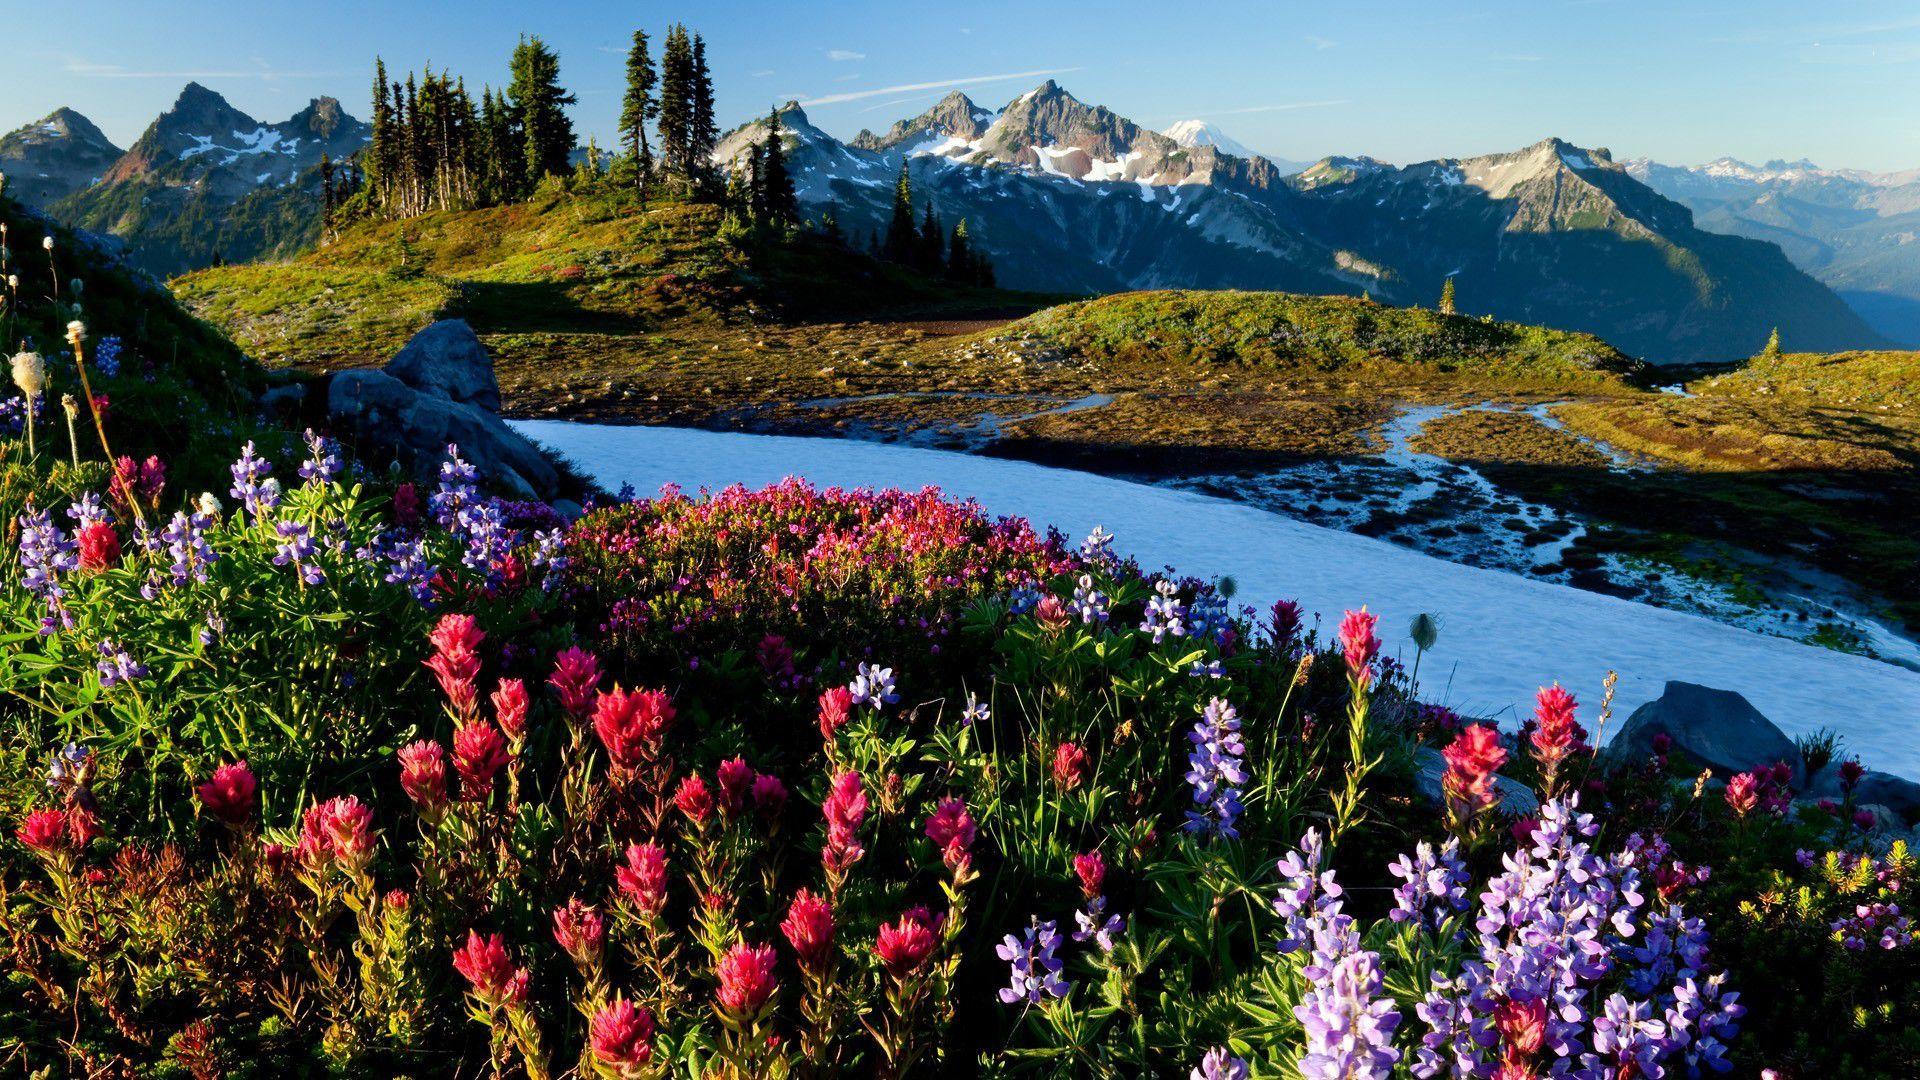 Natural Spring Mountains